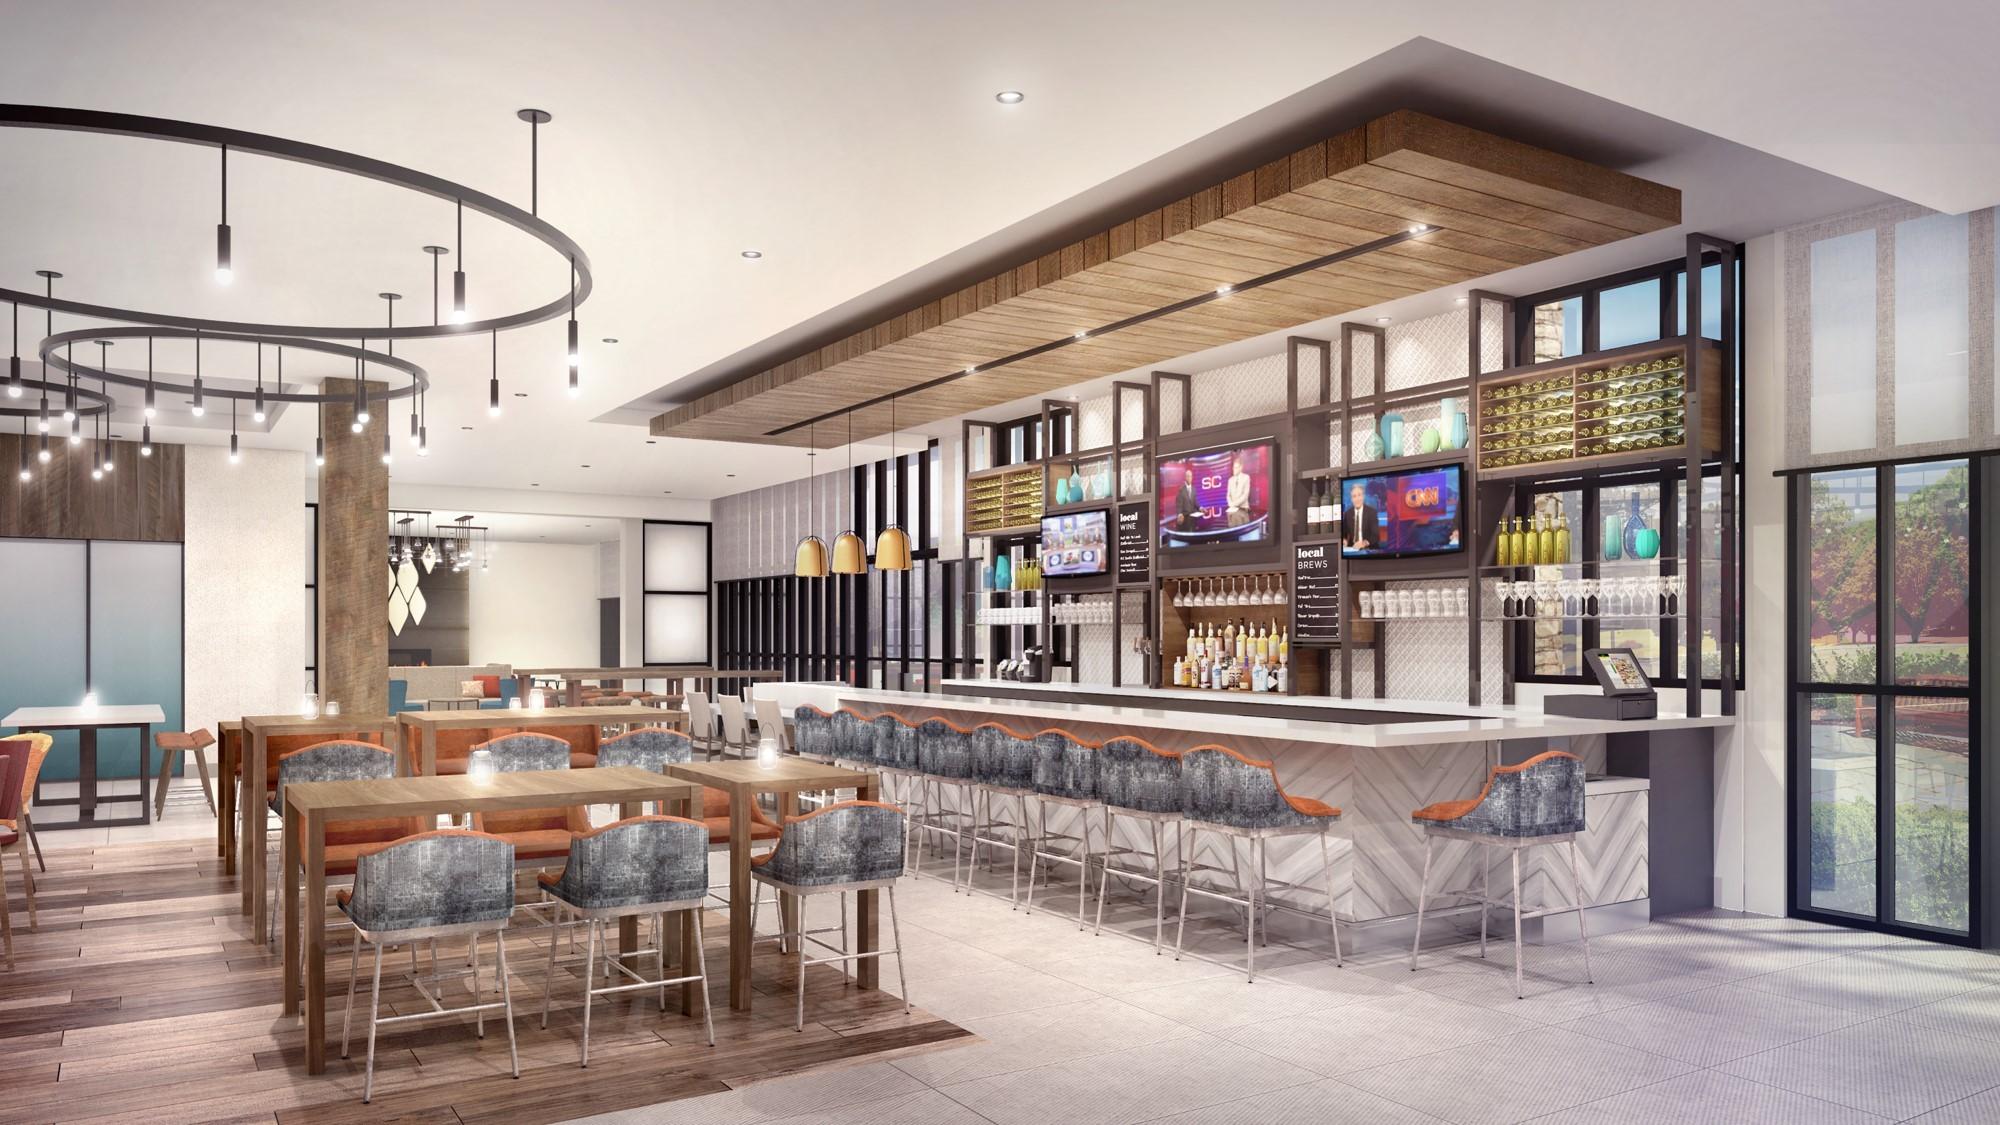 Hilton Garden Inn Brand Refresh Caters to Evolving Needs of